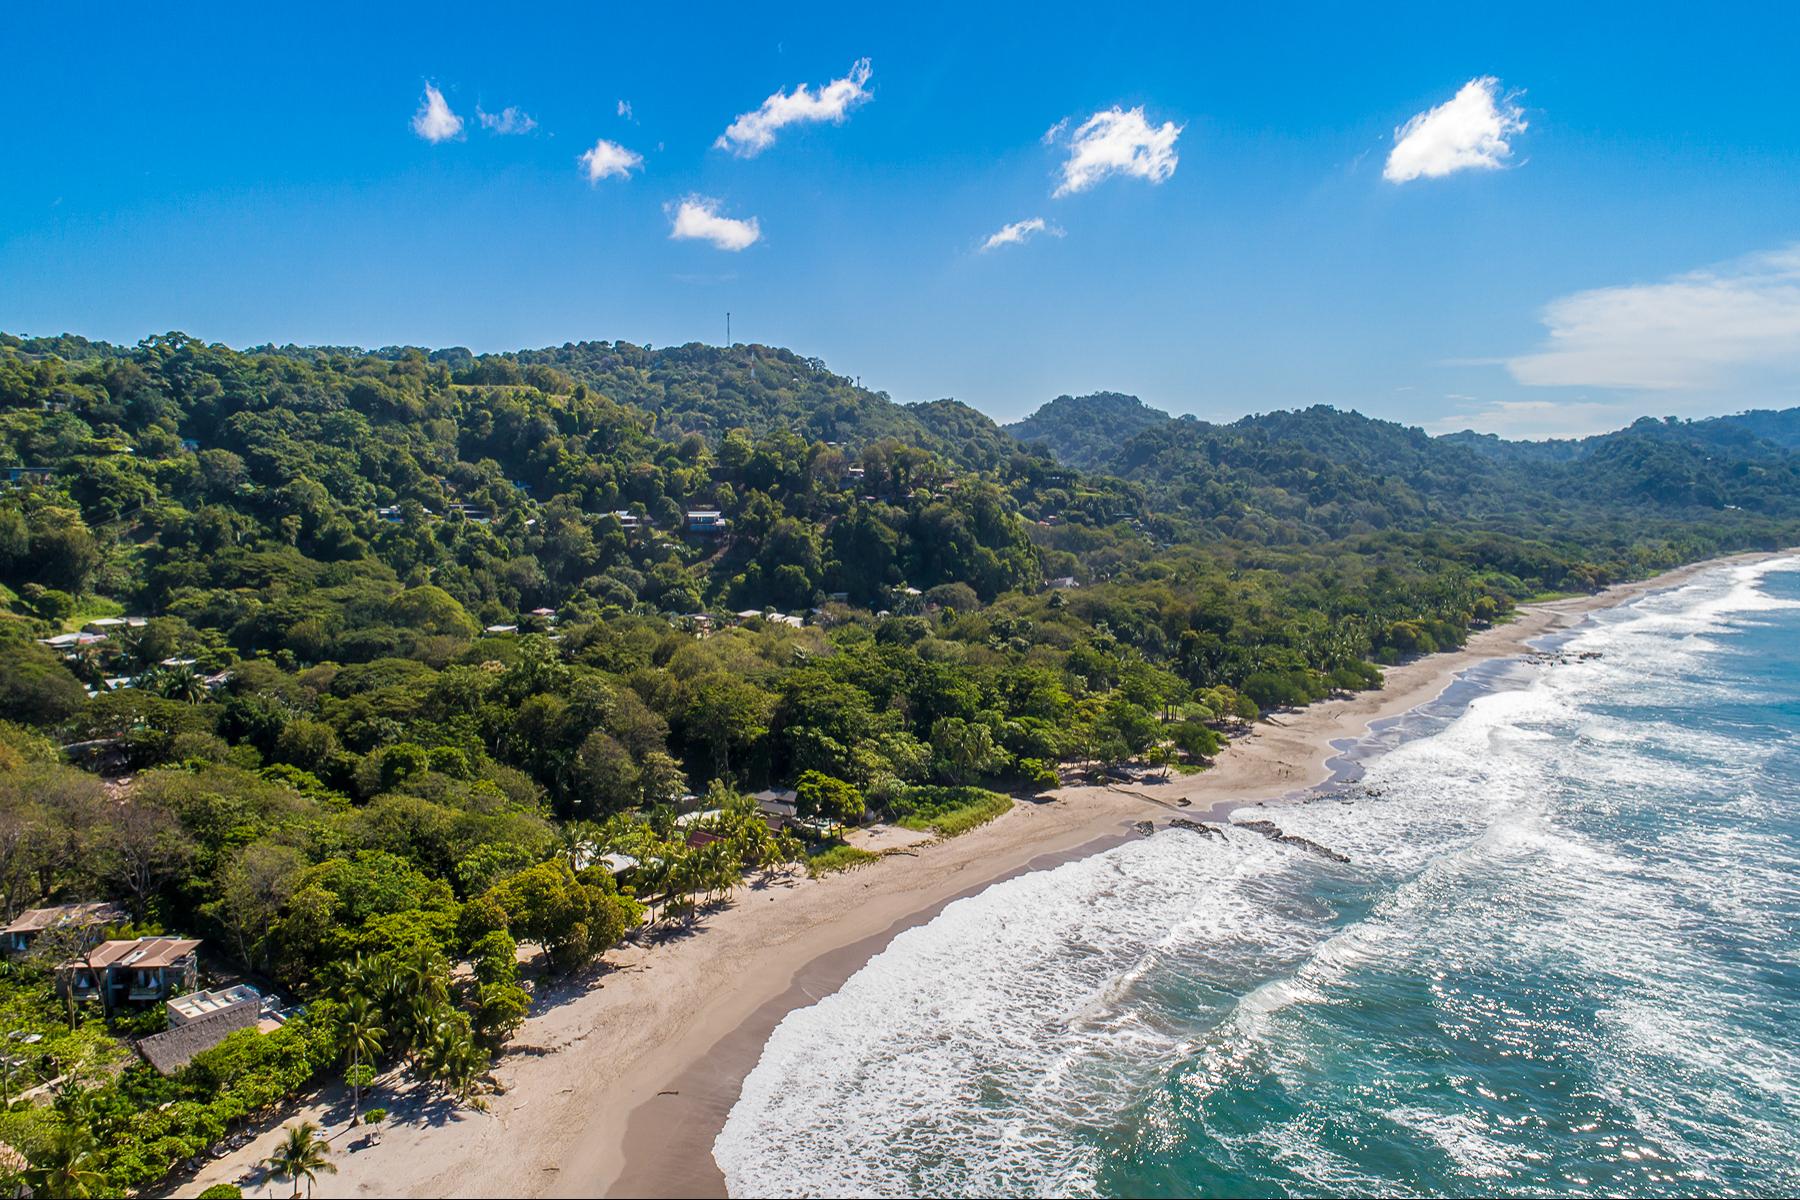 Terreno por un Venta en Santa Teresa Beachfront Development Property Puntarenas, Puntarenas Costa Rica